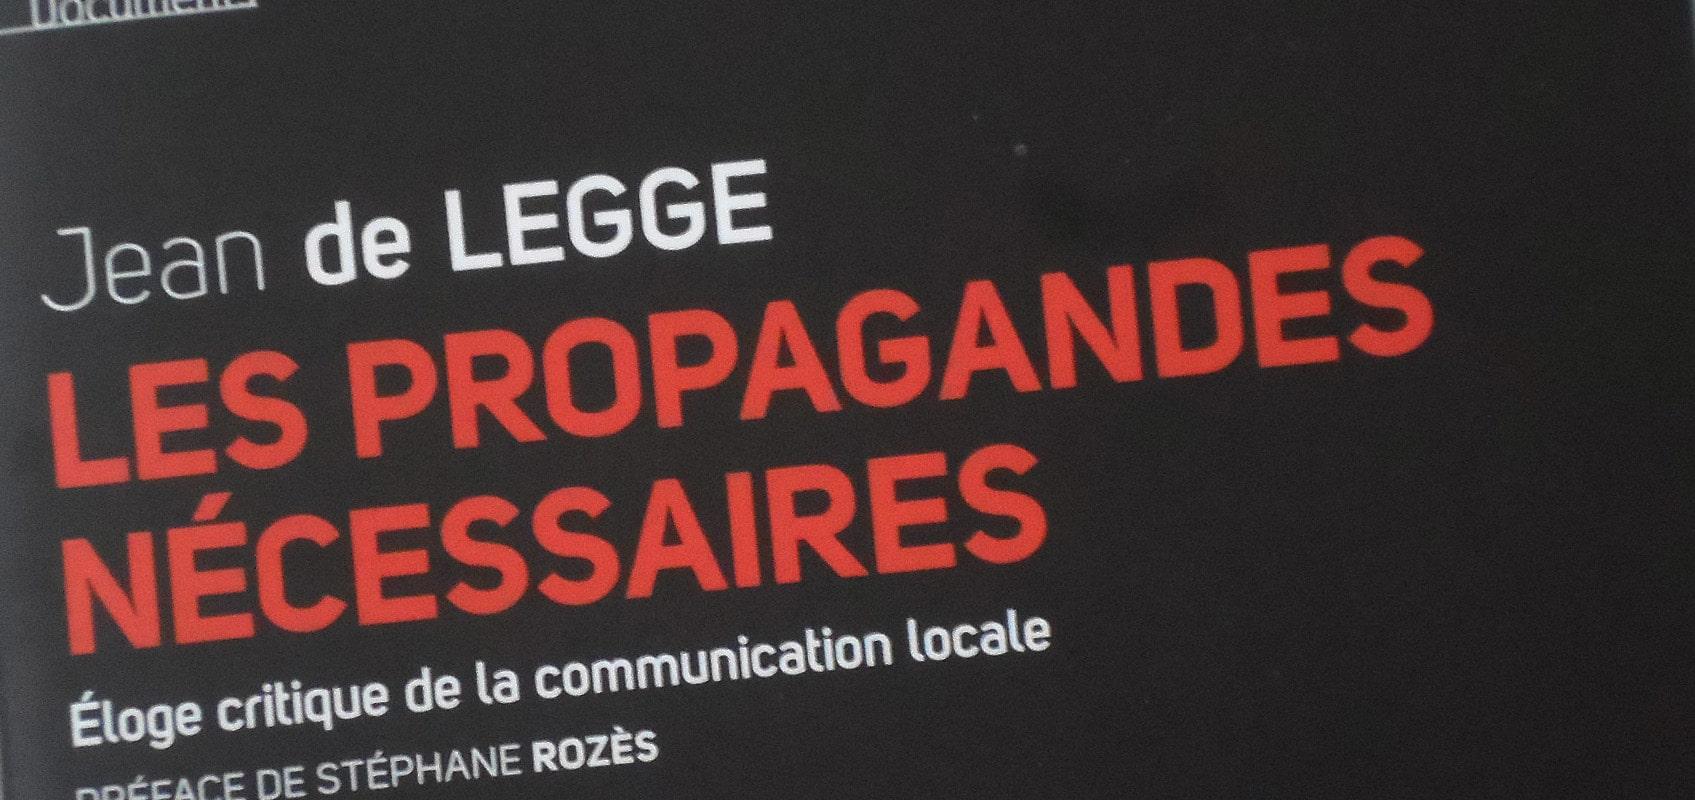 Jean de Legge fait l'éloge de la propagande municipale